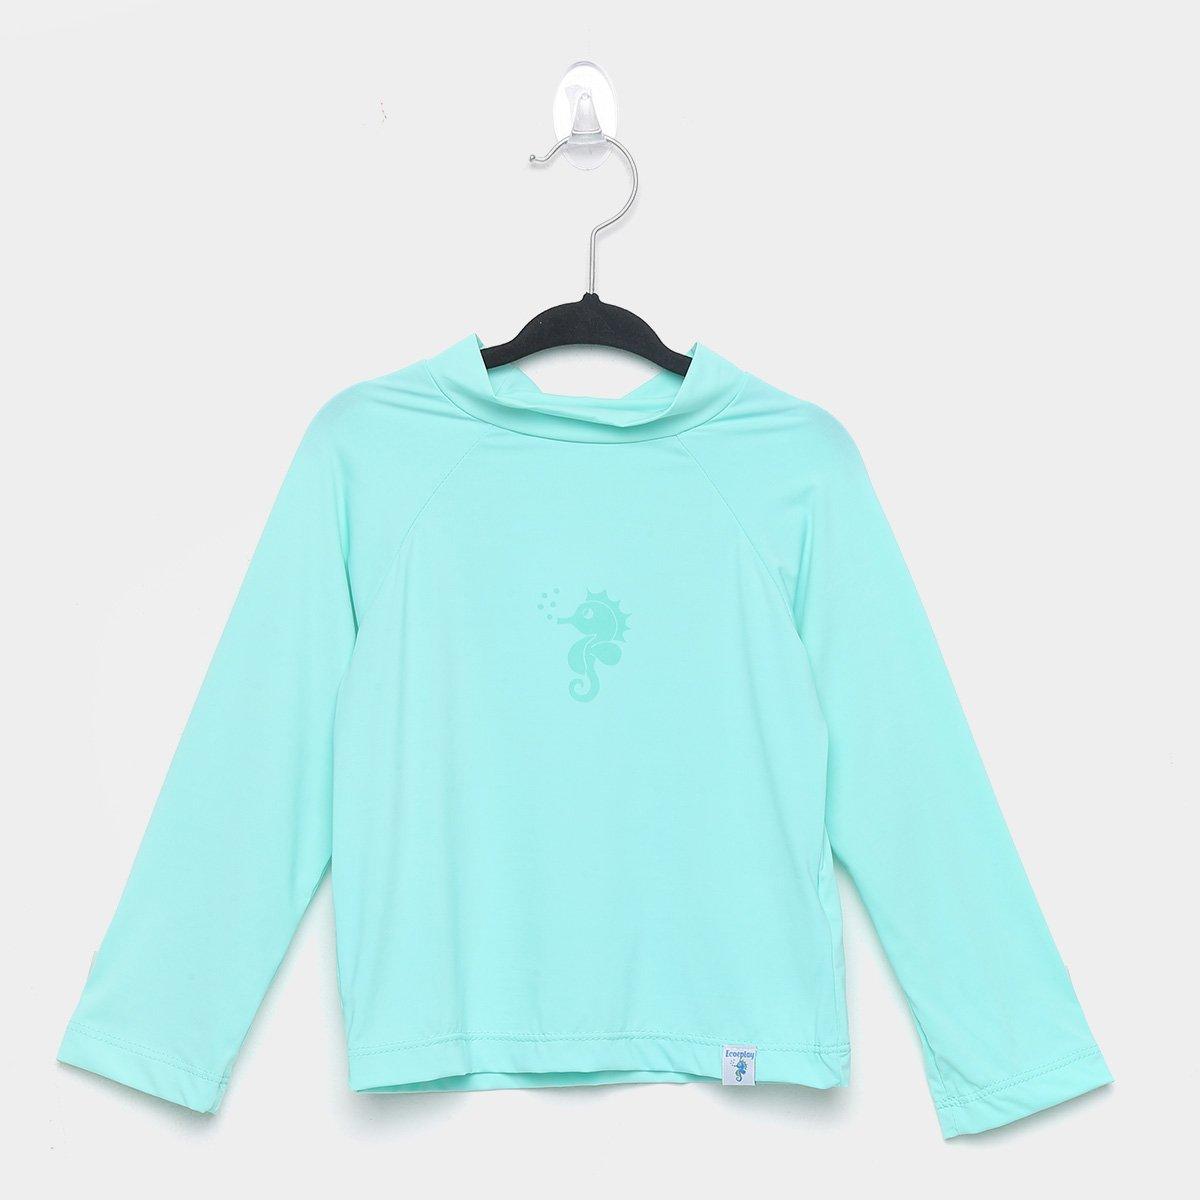 Camiseta Bebê Ecoeplay Manga Longa Proteção UV Masculina